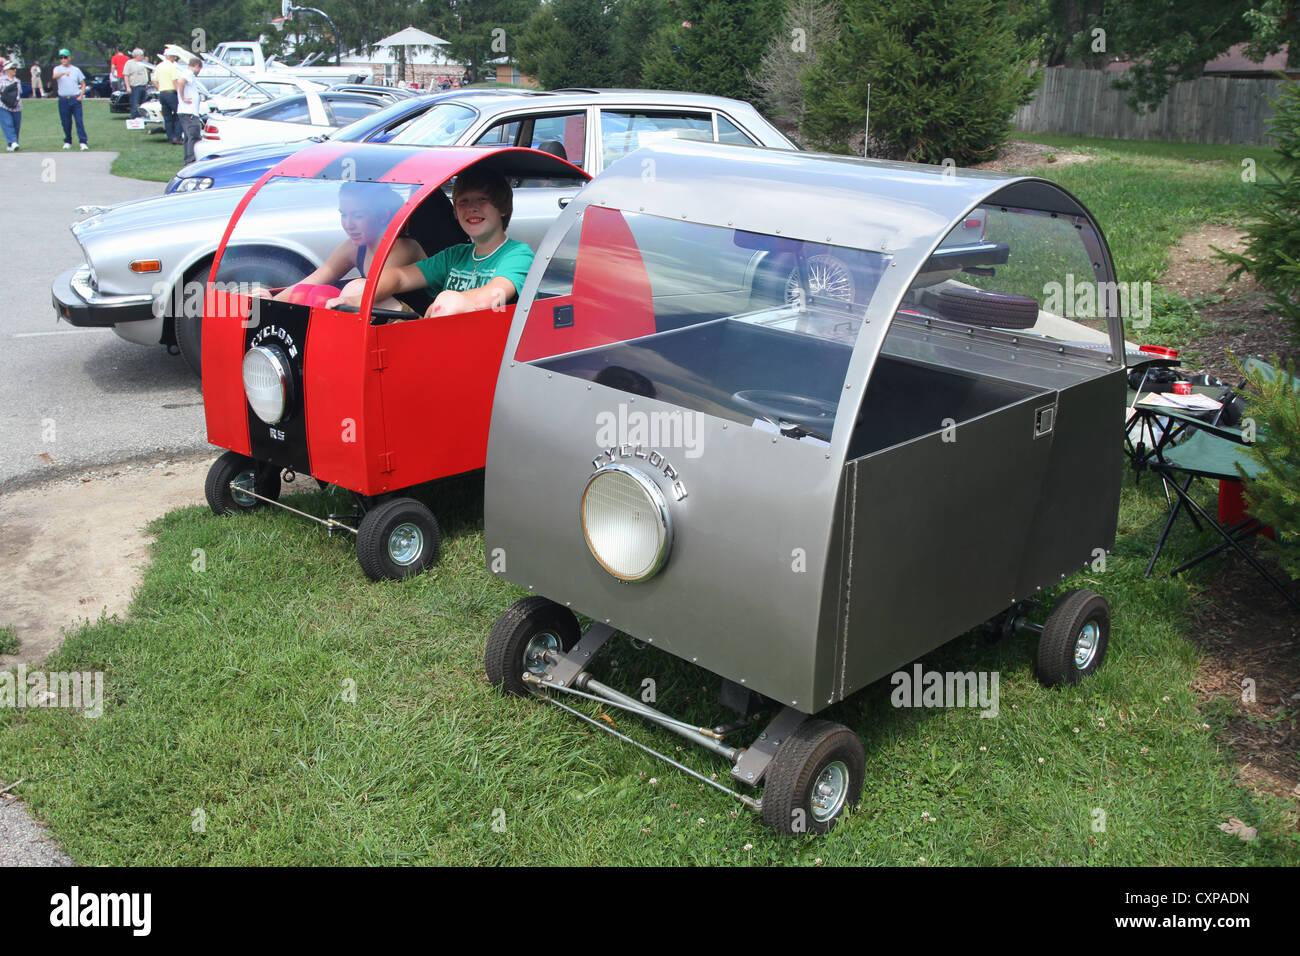 Cyclops car. Beavercreek Popcorn Festival Car Show. Beavercreek Popcorn Festival, Beavercreek, Dayton, Ohio, USA. - Stock Image